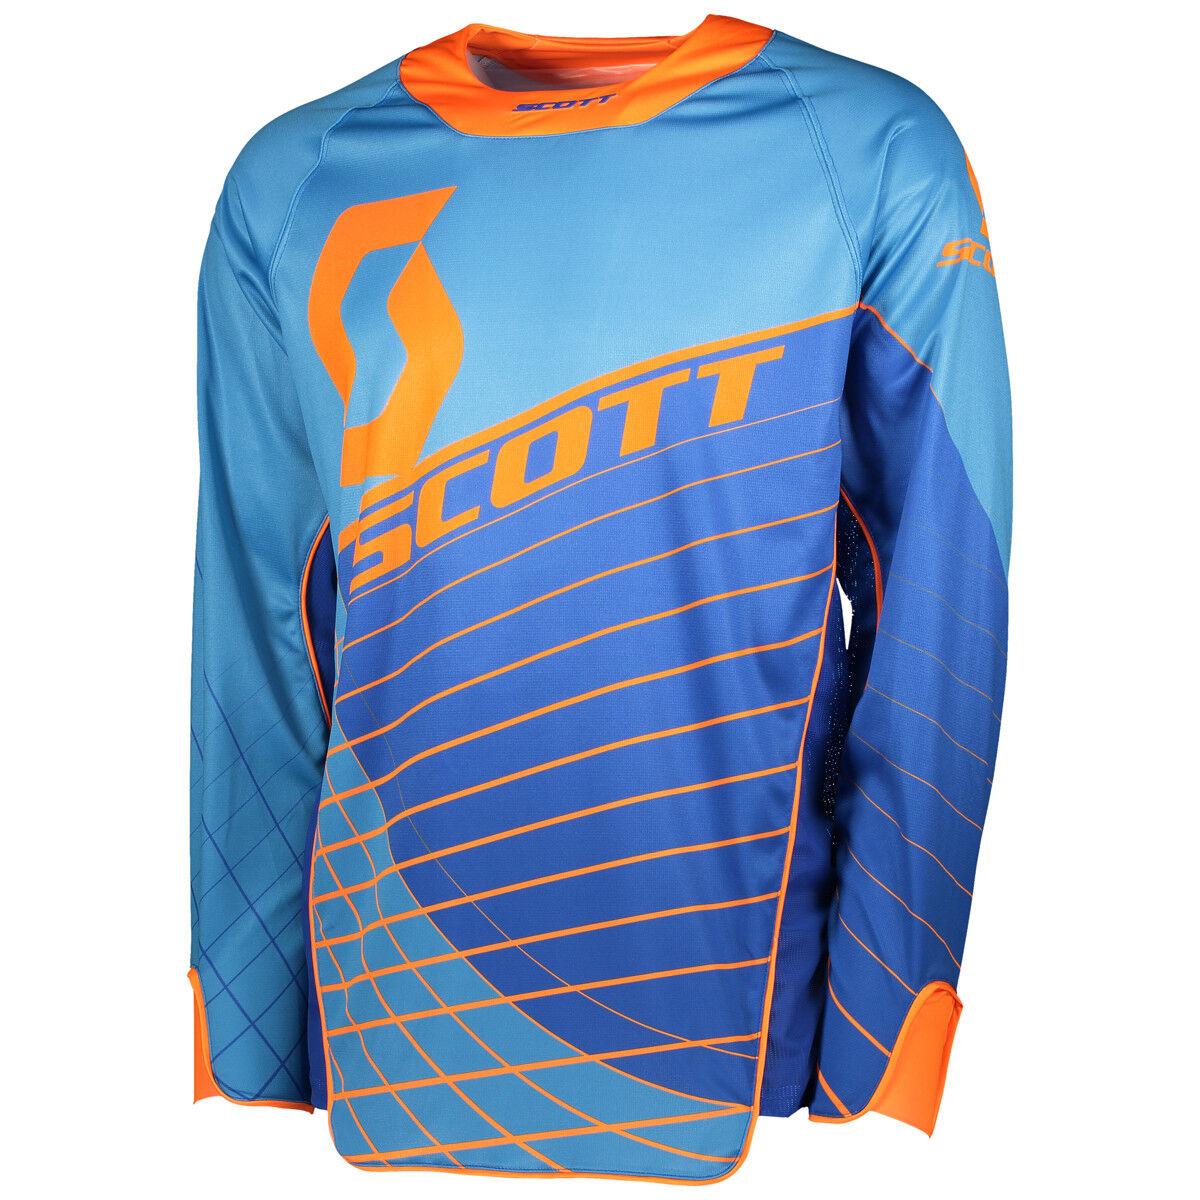 Scott Scott Scott Enduro MX Motocross Jersey   DH Fahrrad Trikot blau Orange 2018 4b3927